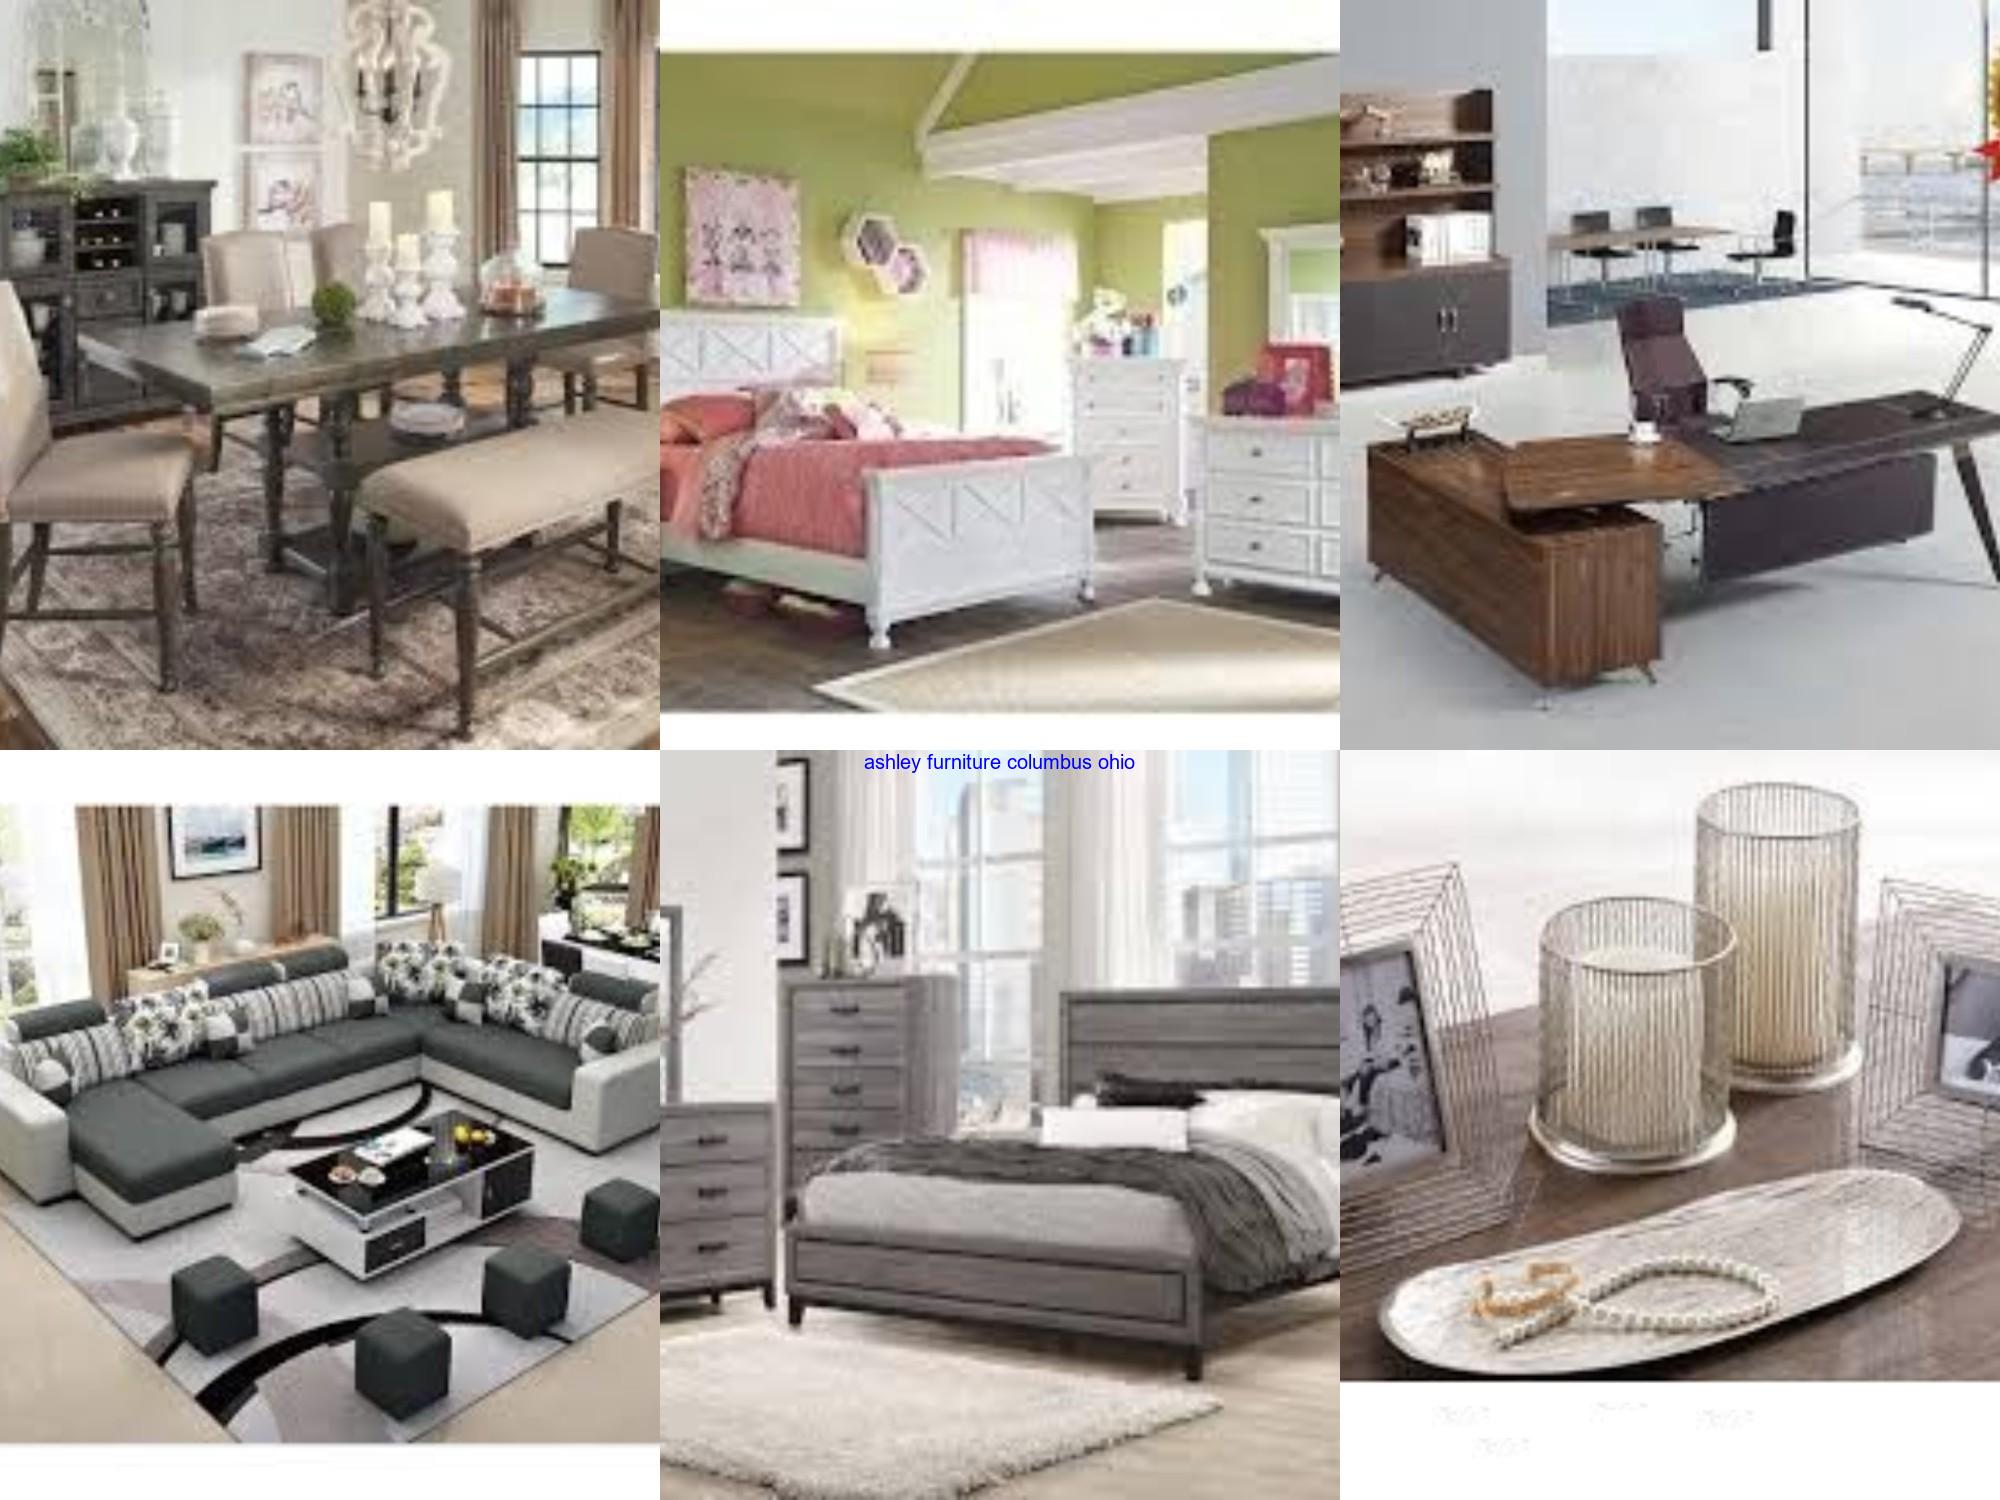 Ashley Furniture Columbus Ohio In 2020 Furniture Prices Ashley Furniture Furniture Reviews